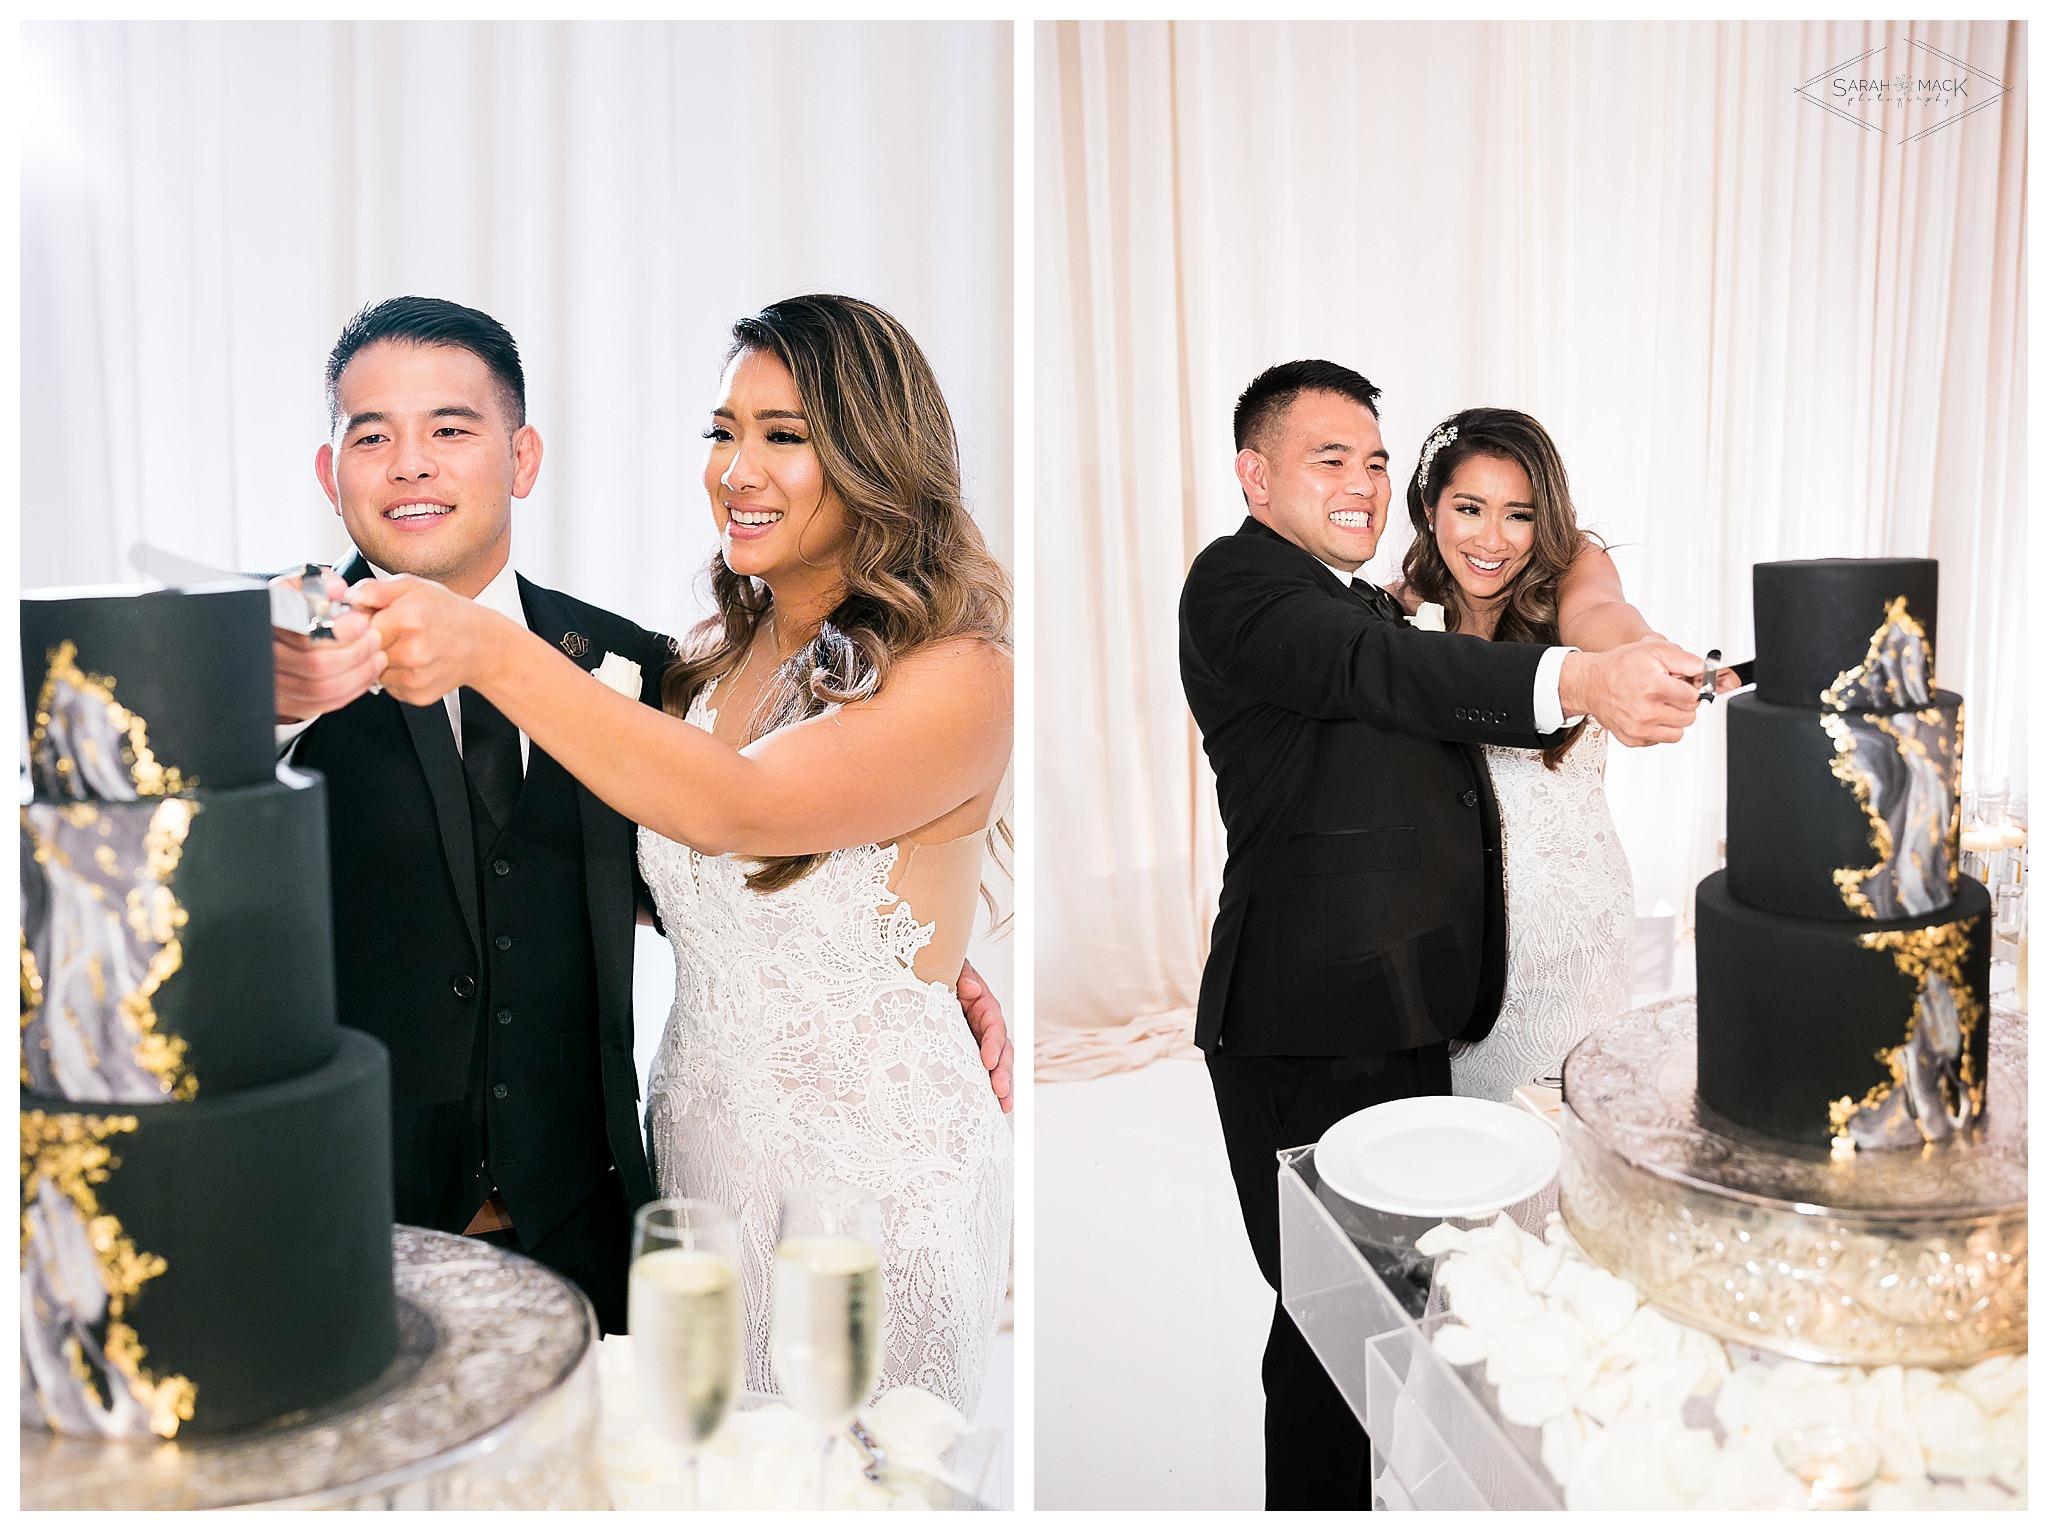 LE-Avenue-of-the-Arts-Costa-Mesa-Wedding-Photography-0206.jpg